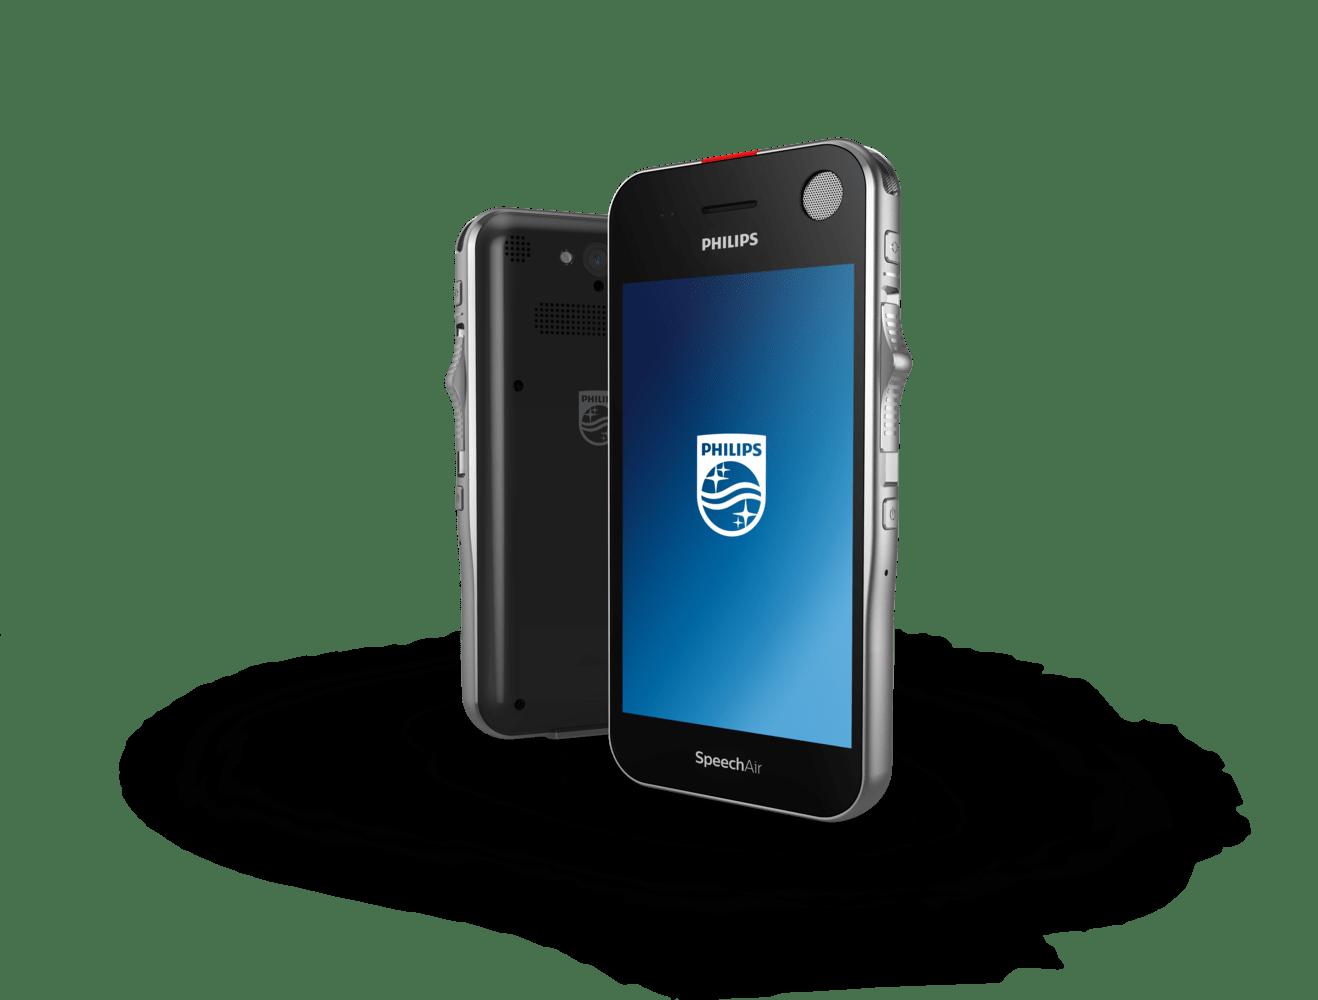 SpeechAir Smart Voice Recorder PSP1000 | Philips